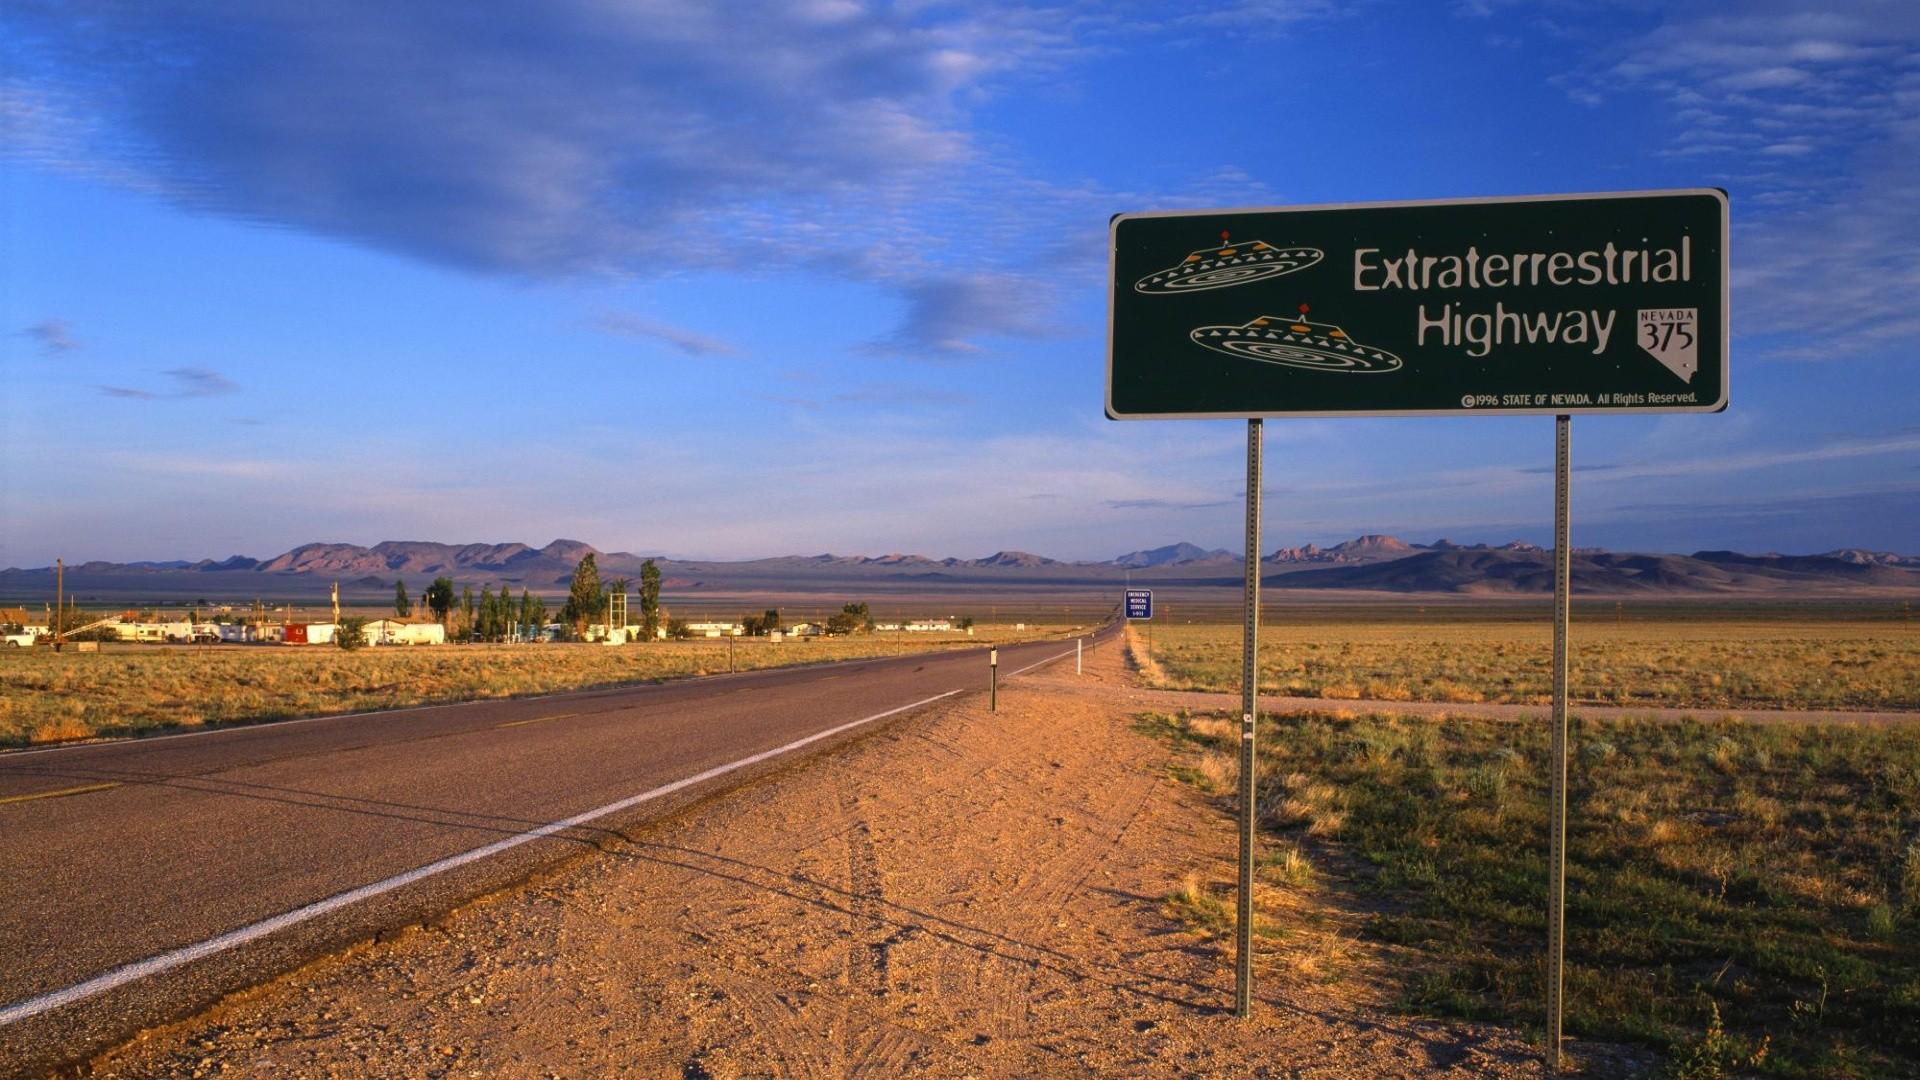 Area 51 wallpaper 69 images - Nevada wallpaper hd ...